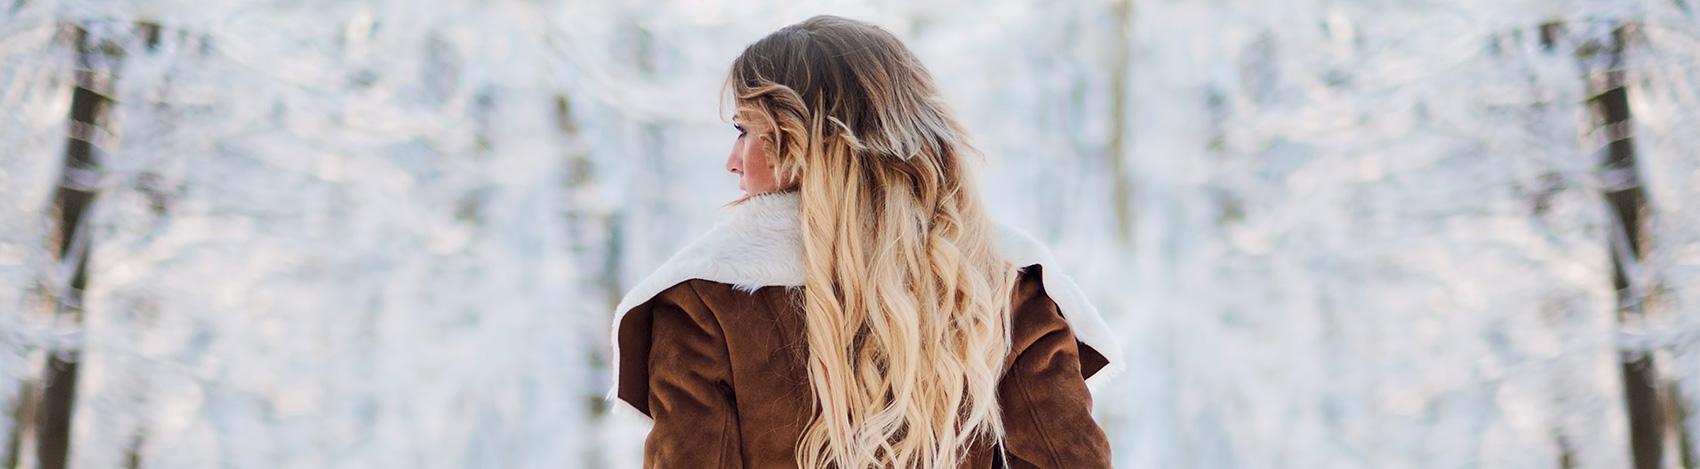 One-Walk-In-Winter_Beers_hero